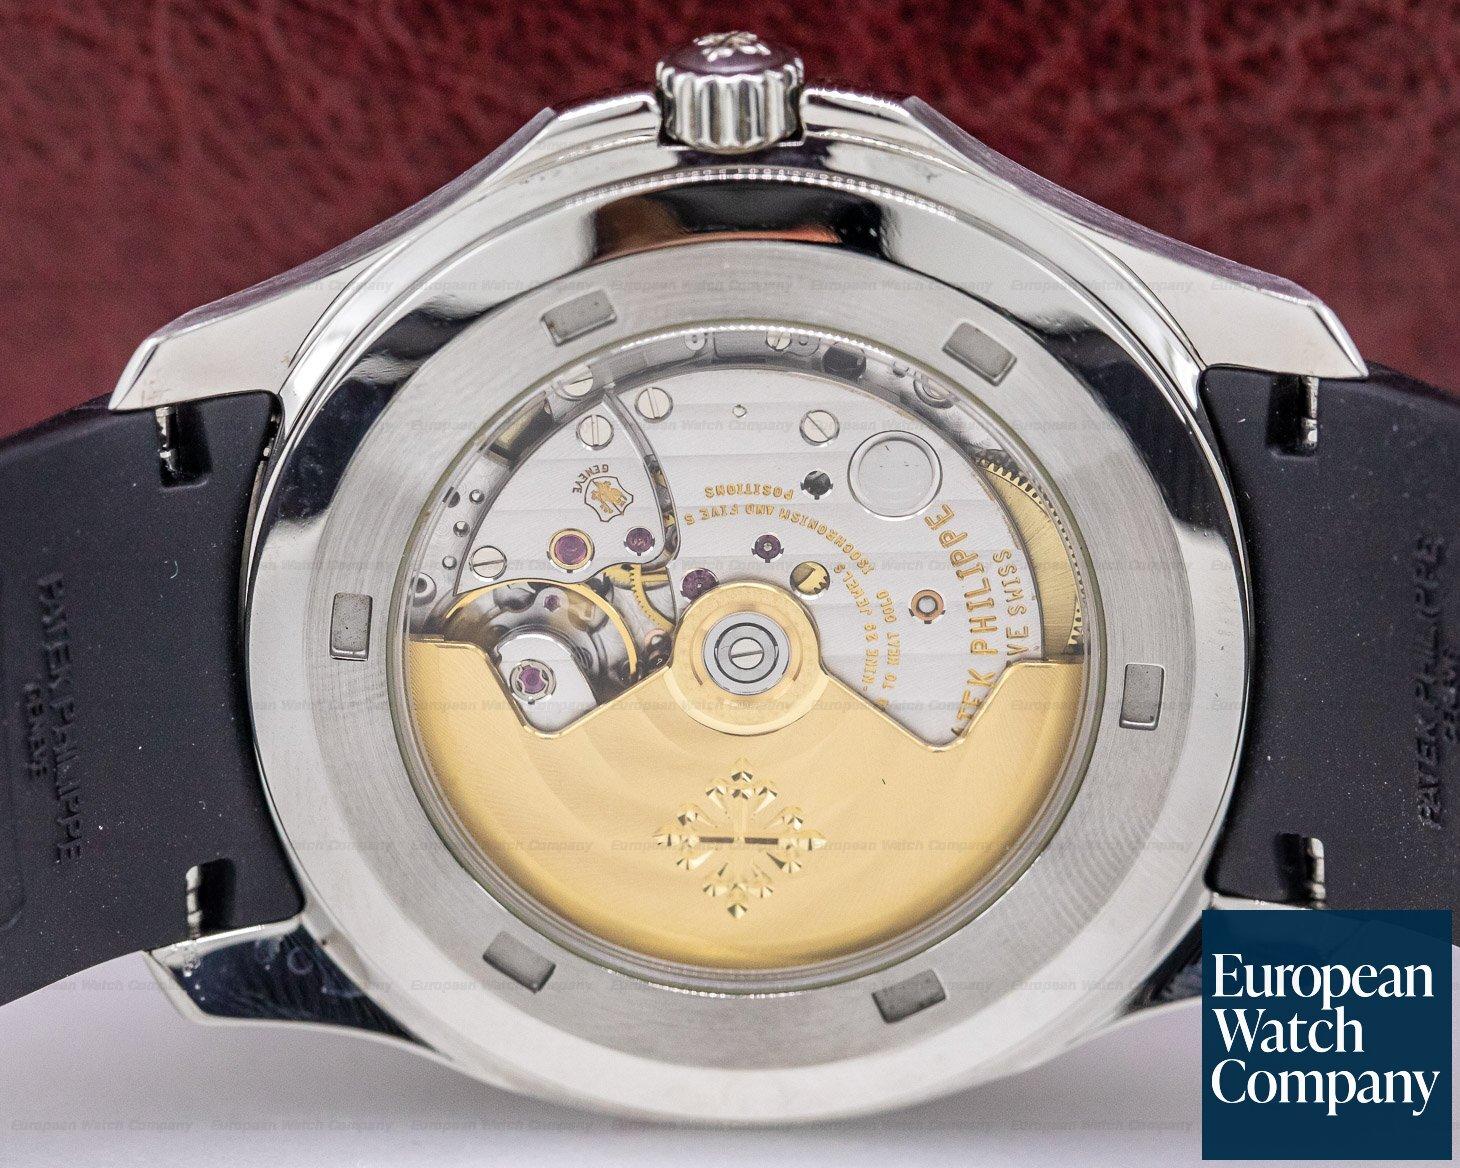 Patek Philippe 5167A-001 Aquanaut 5167 SS / Rubber